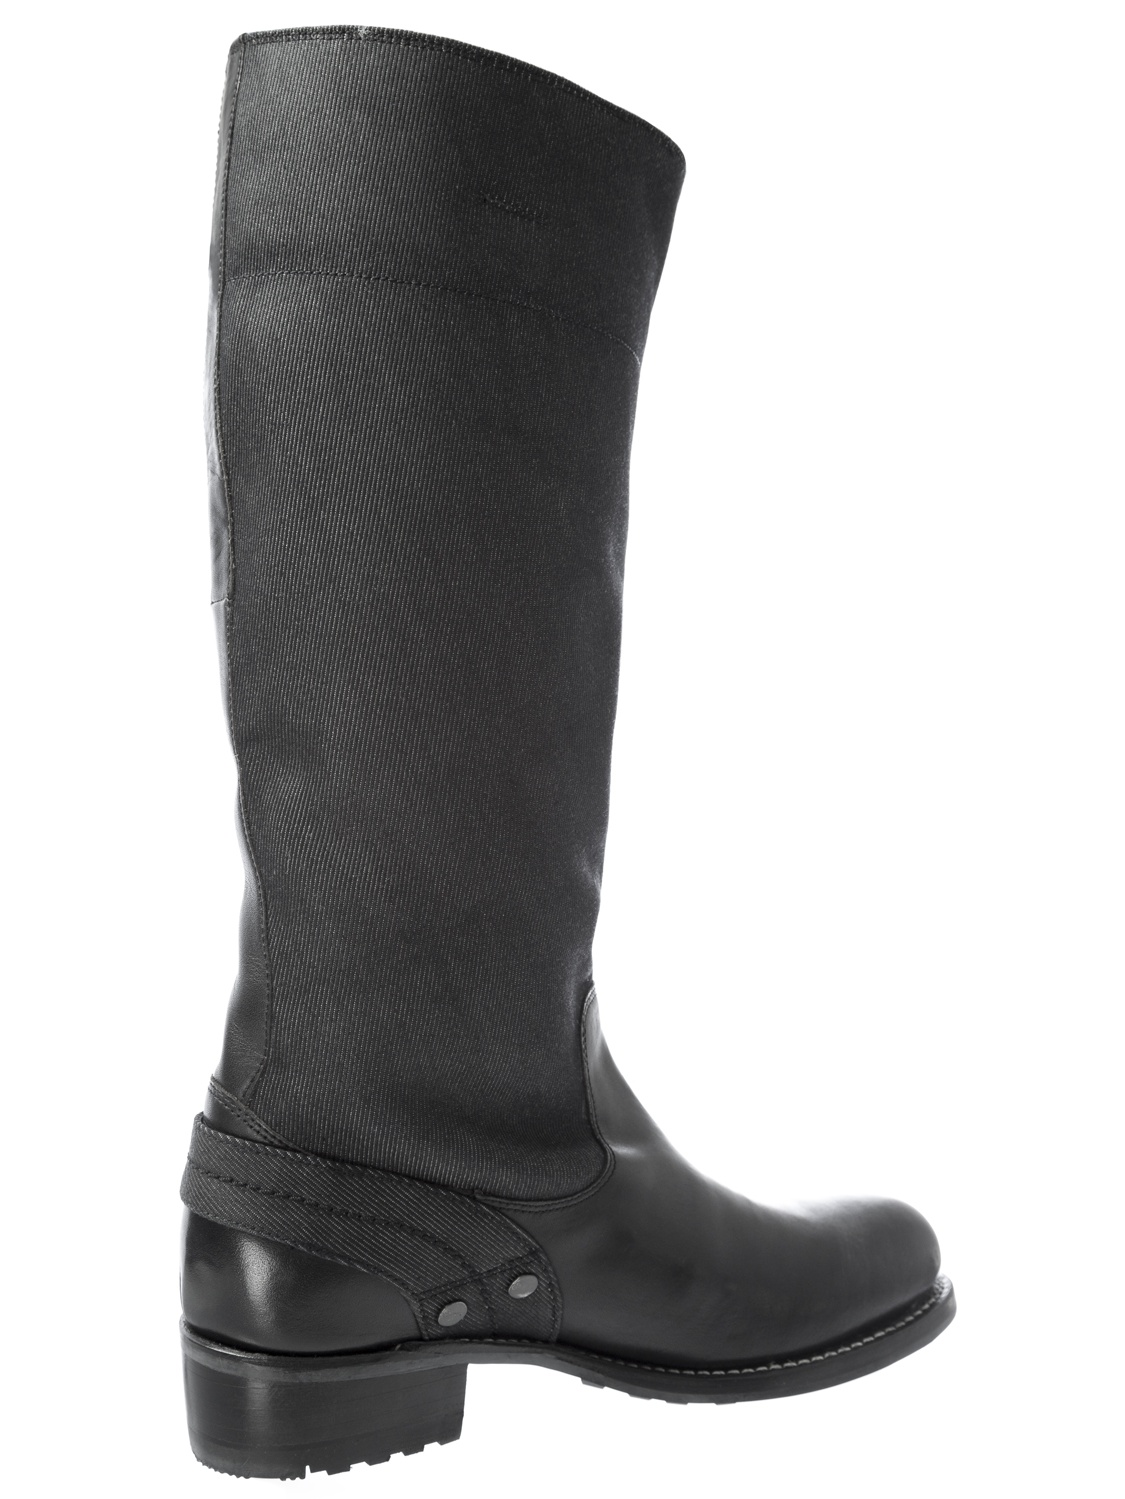 G-STAR Raw Women/'s PATTON Cinch HI Black /& Denim Boots GS41561//40A NEW